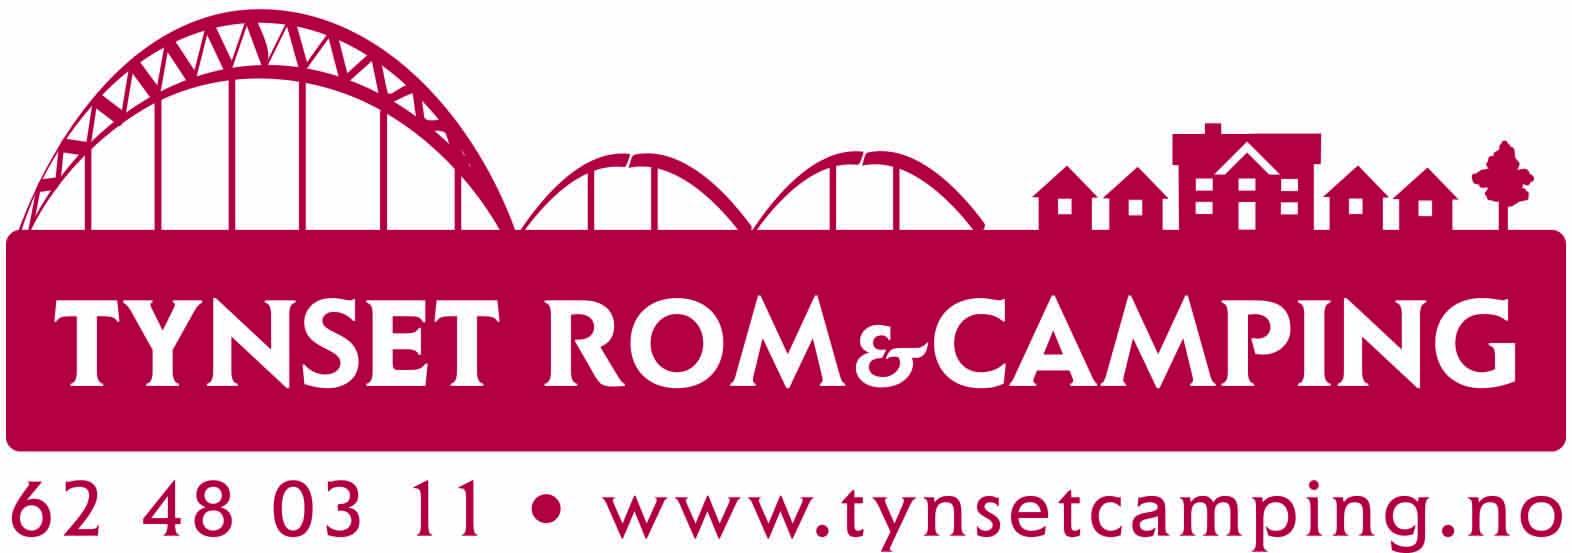 Tynset Rom & Camping